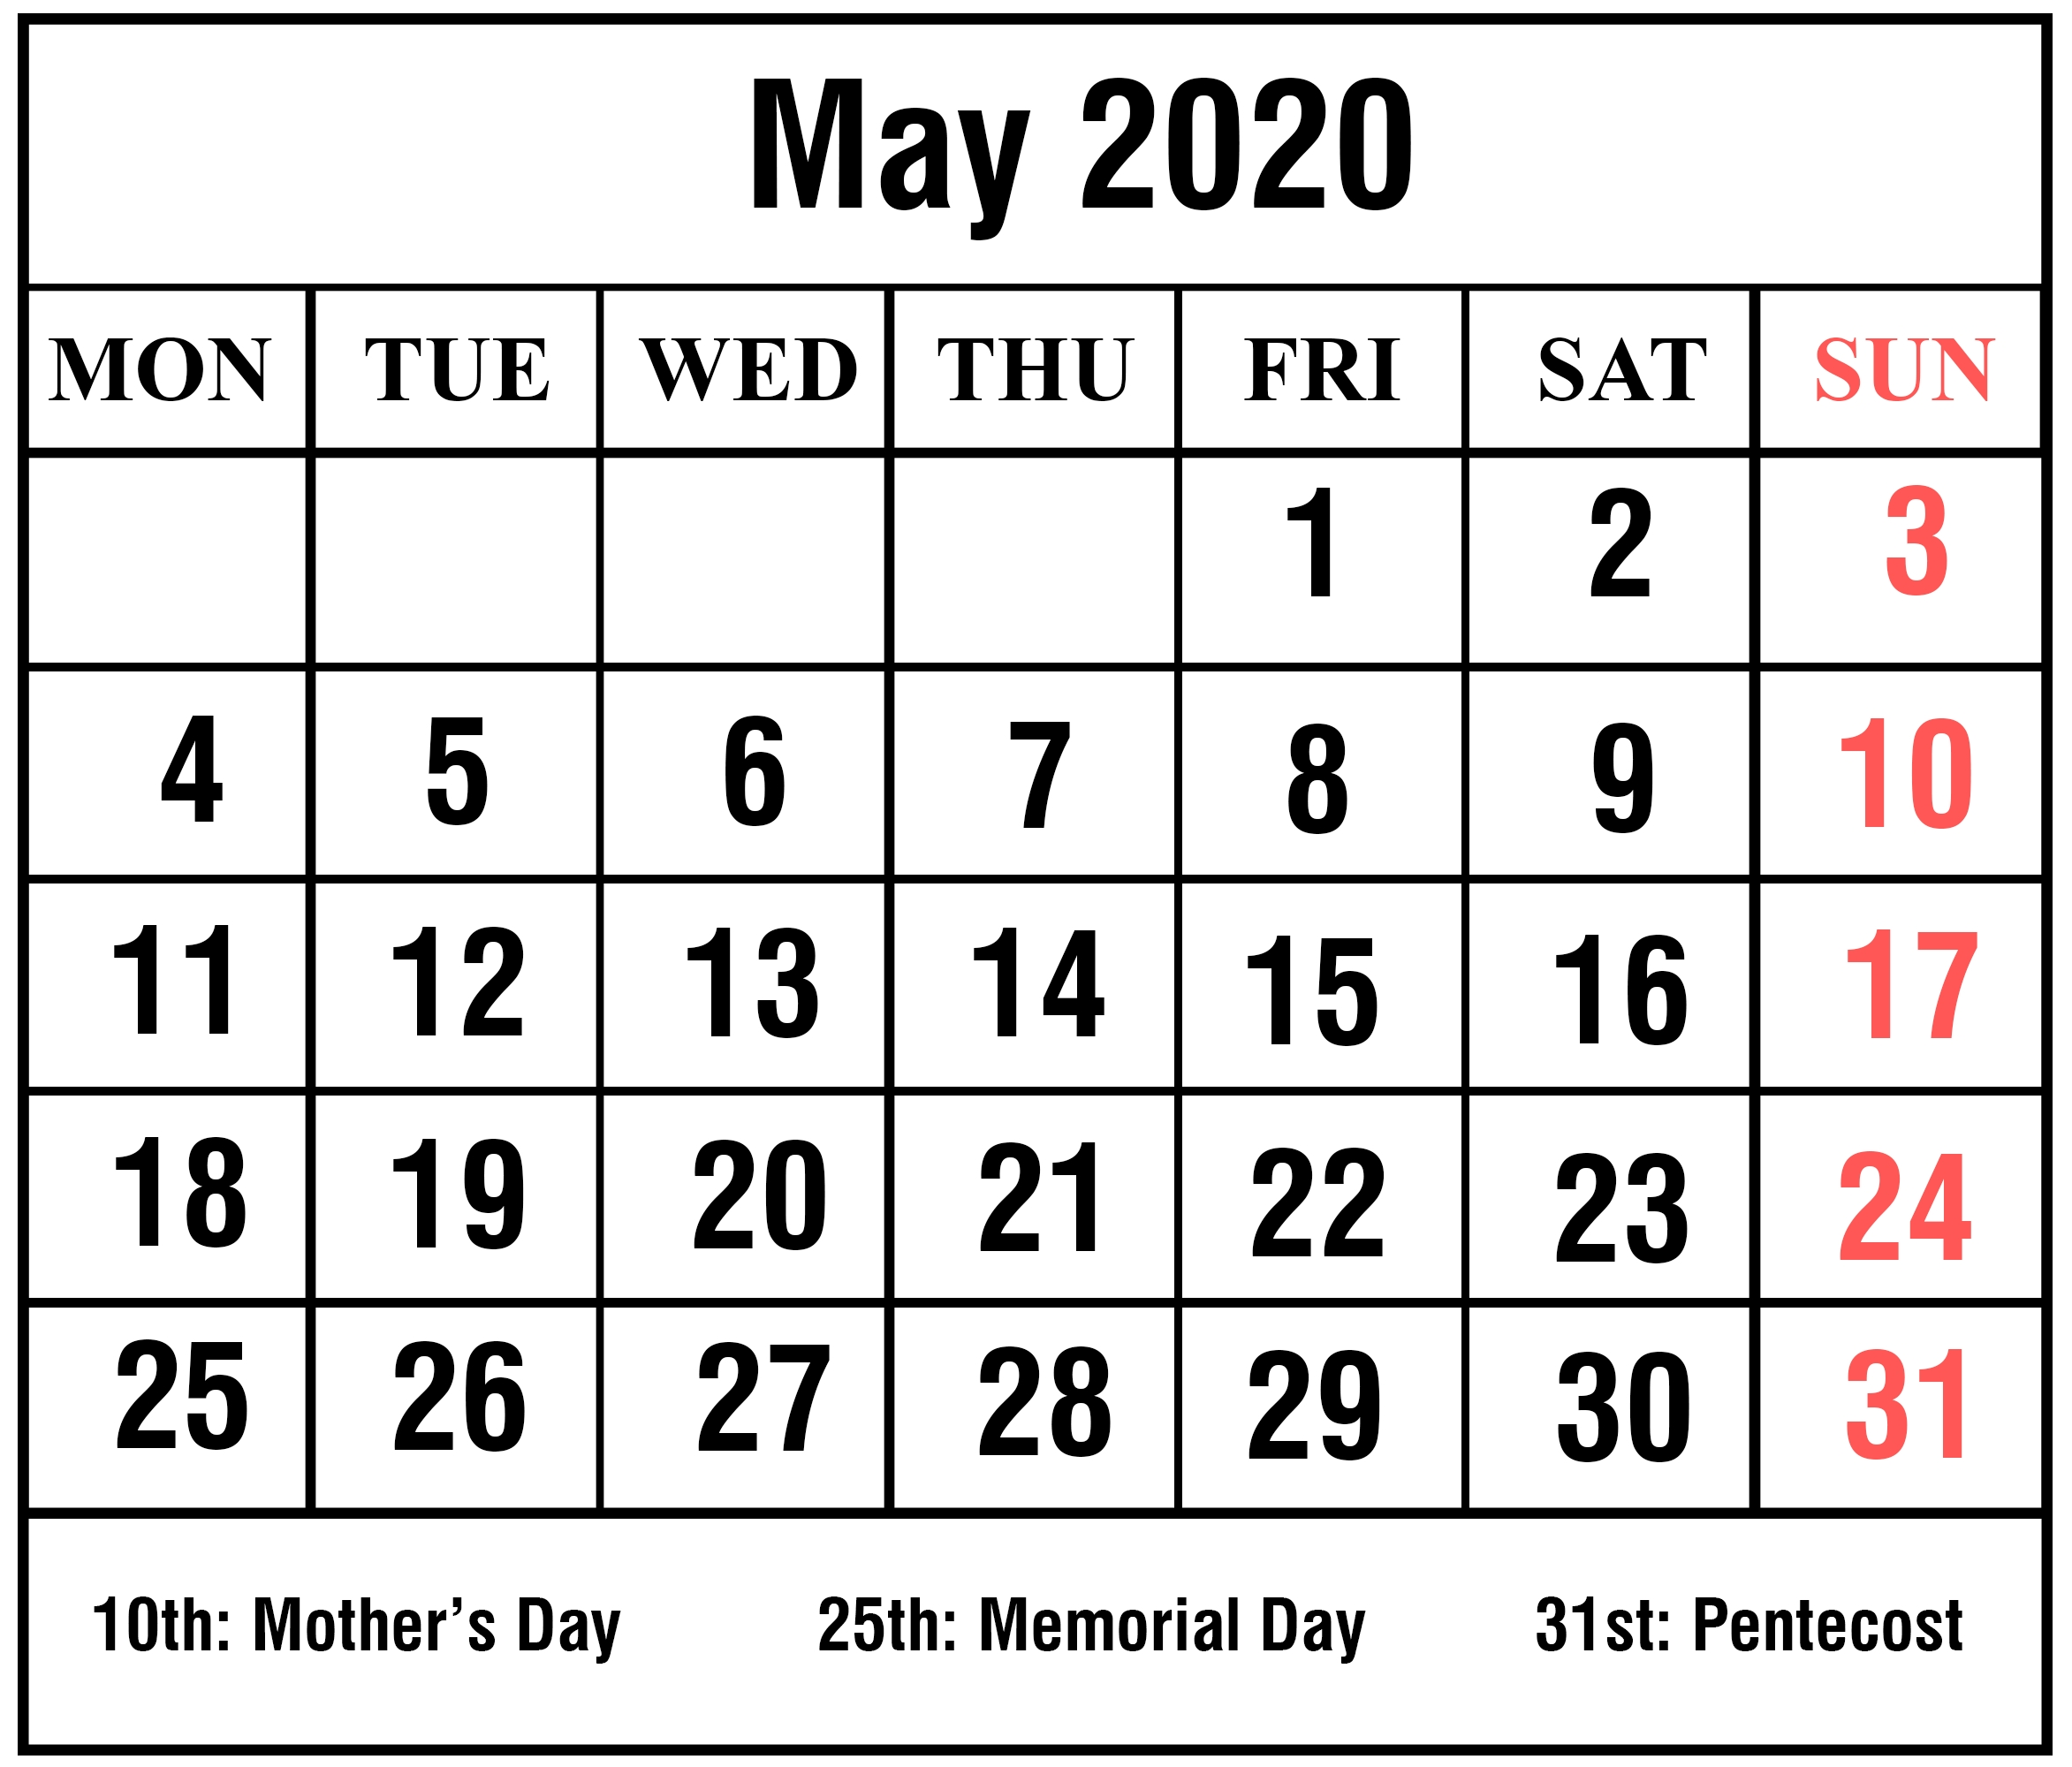 Download Free Blank May 2020 Printable Calendar [Pdf, Excel & Word_Blank Calendar May 2020 Pdf